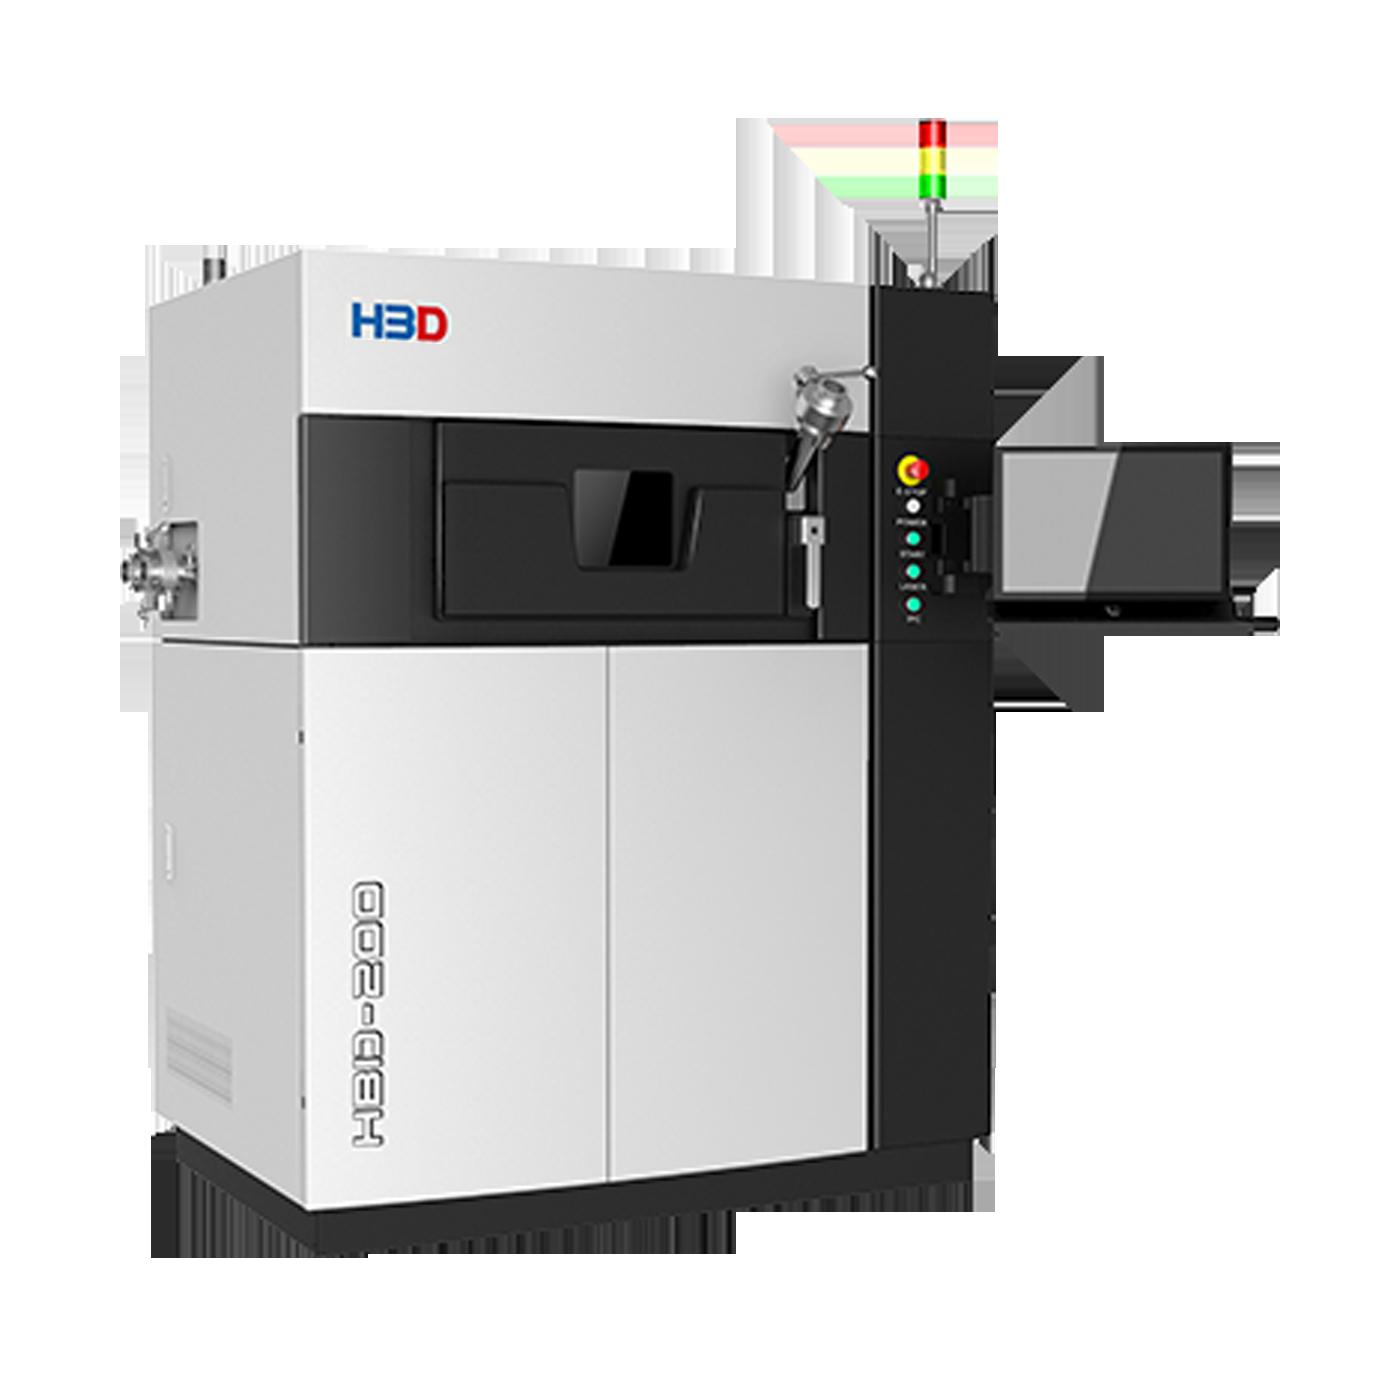 HBD-200 SLM 3D Printer